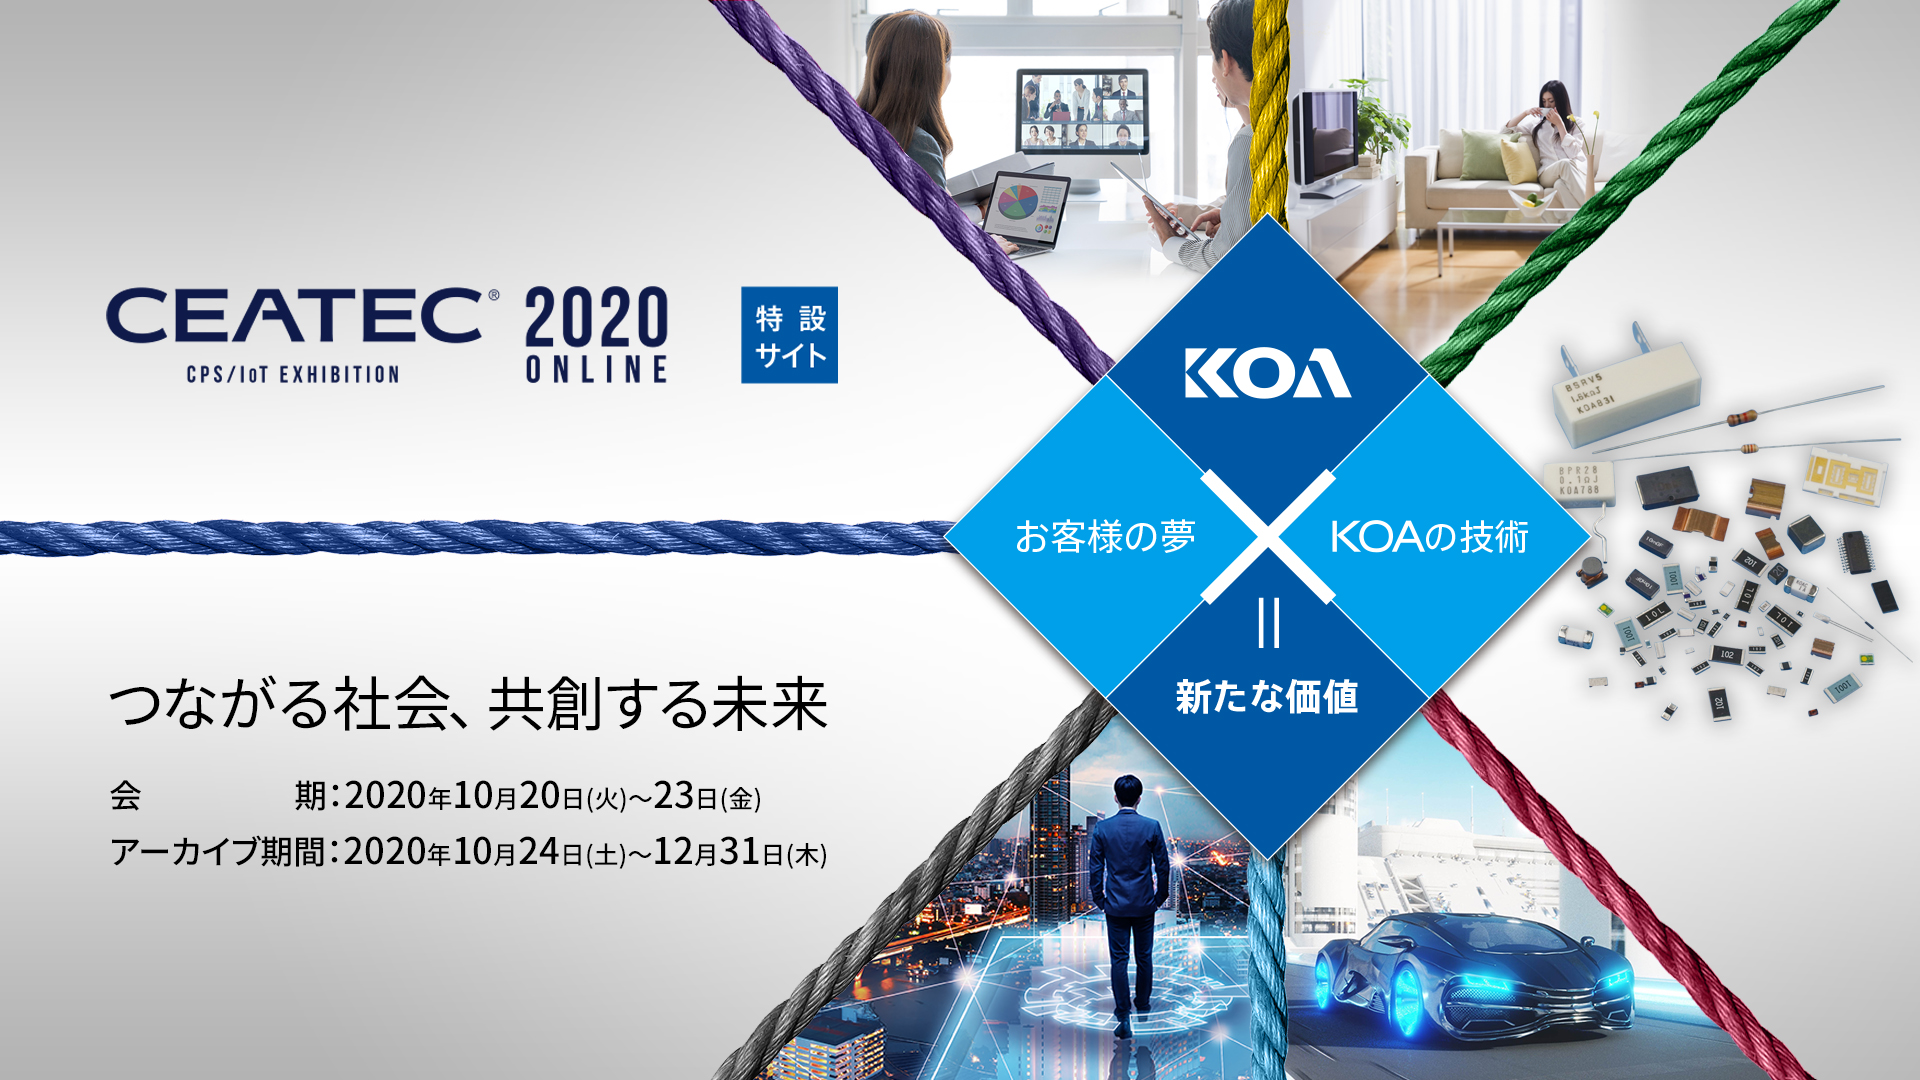 CEATEC 2020 ONLINE特設サイト